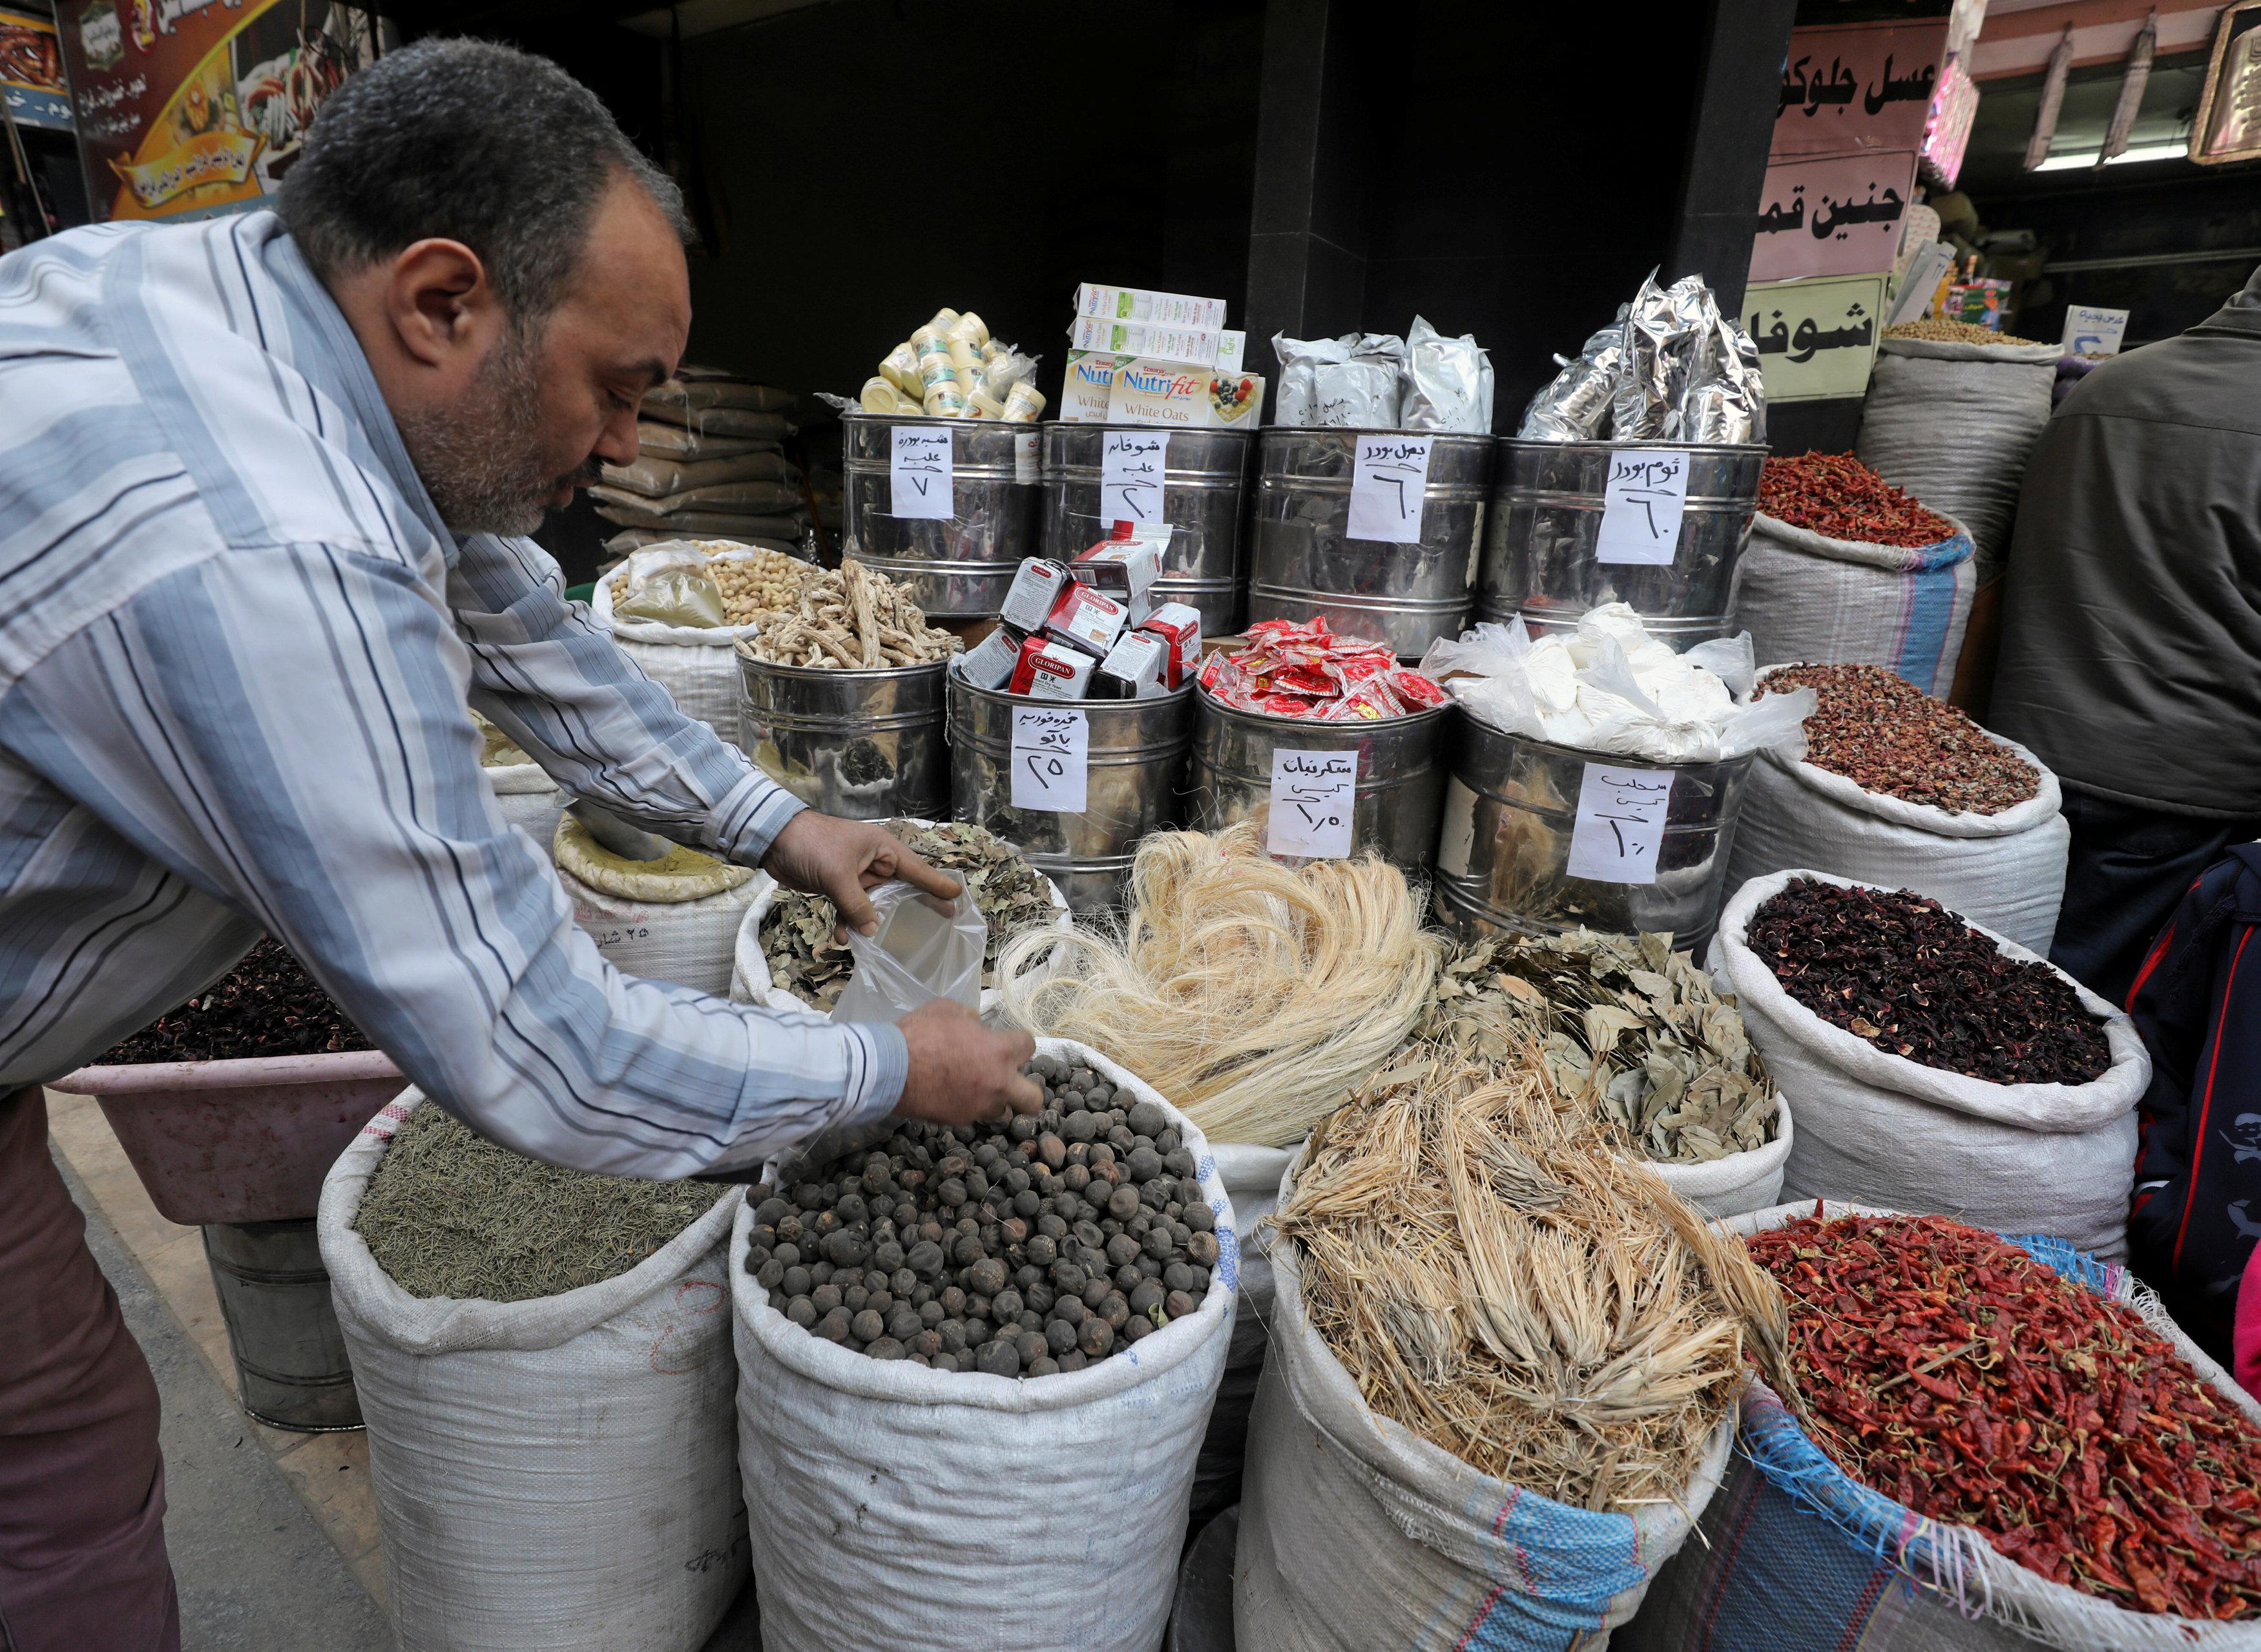 Herbal medicine worker taking spices to make medicine